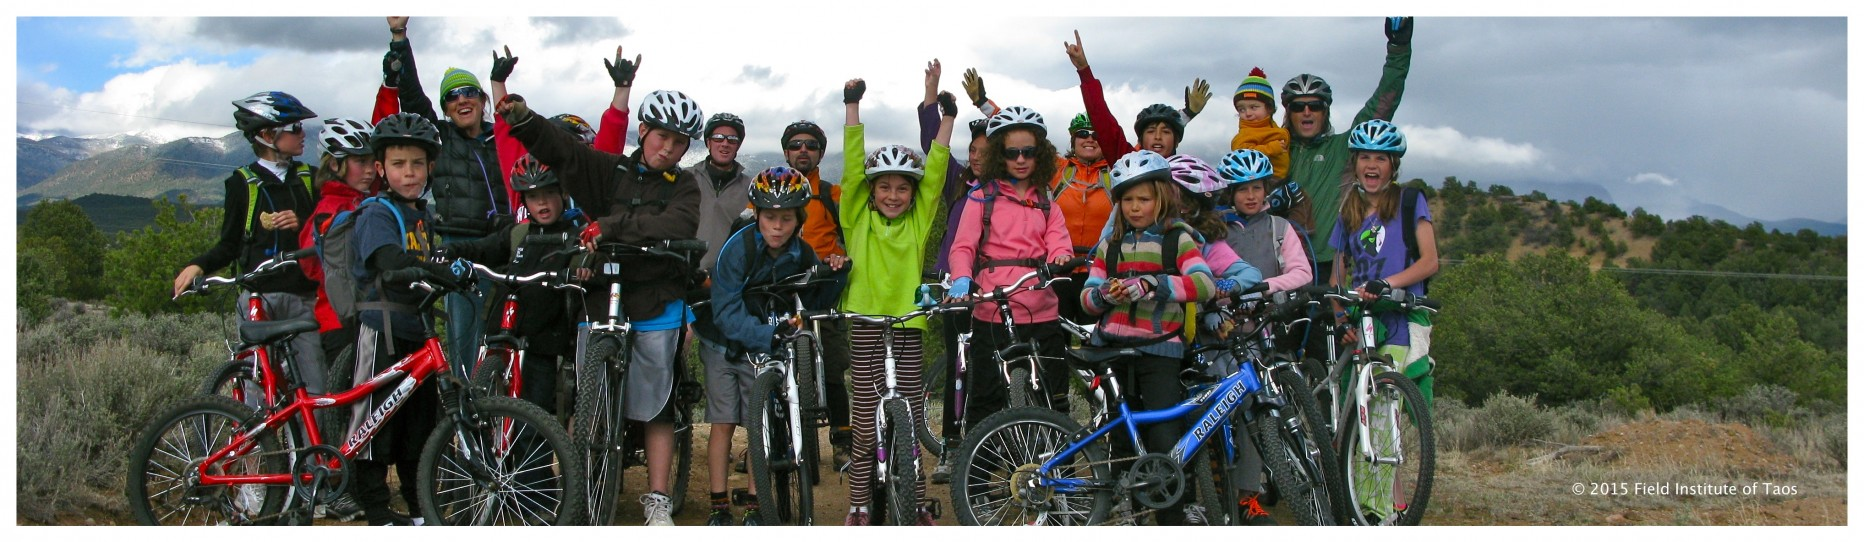 Bike Club Scholarships